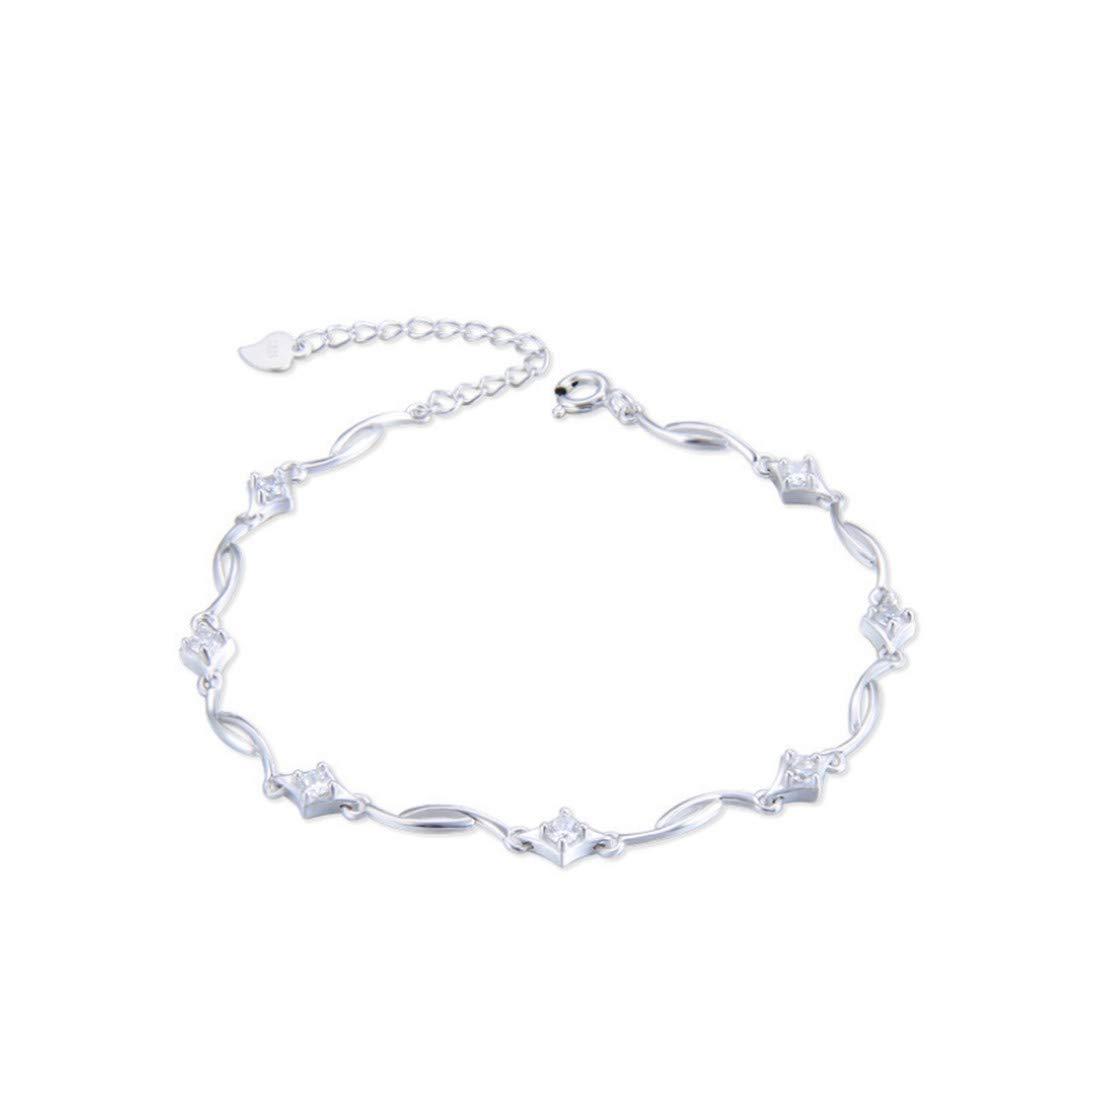 YYYYYAレディースブレスレットS925シルバーファッショナブルなシンプルな幾何学優雅な女性の結婚式の宝石類女性の宝石類のギフト   B07M86GG33